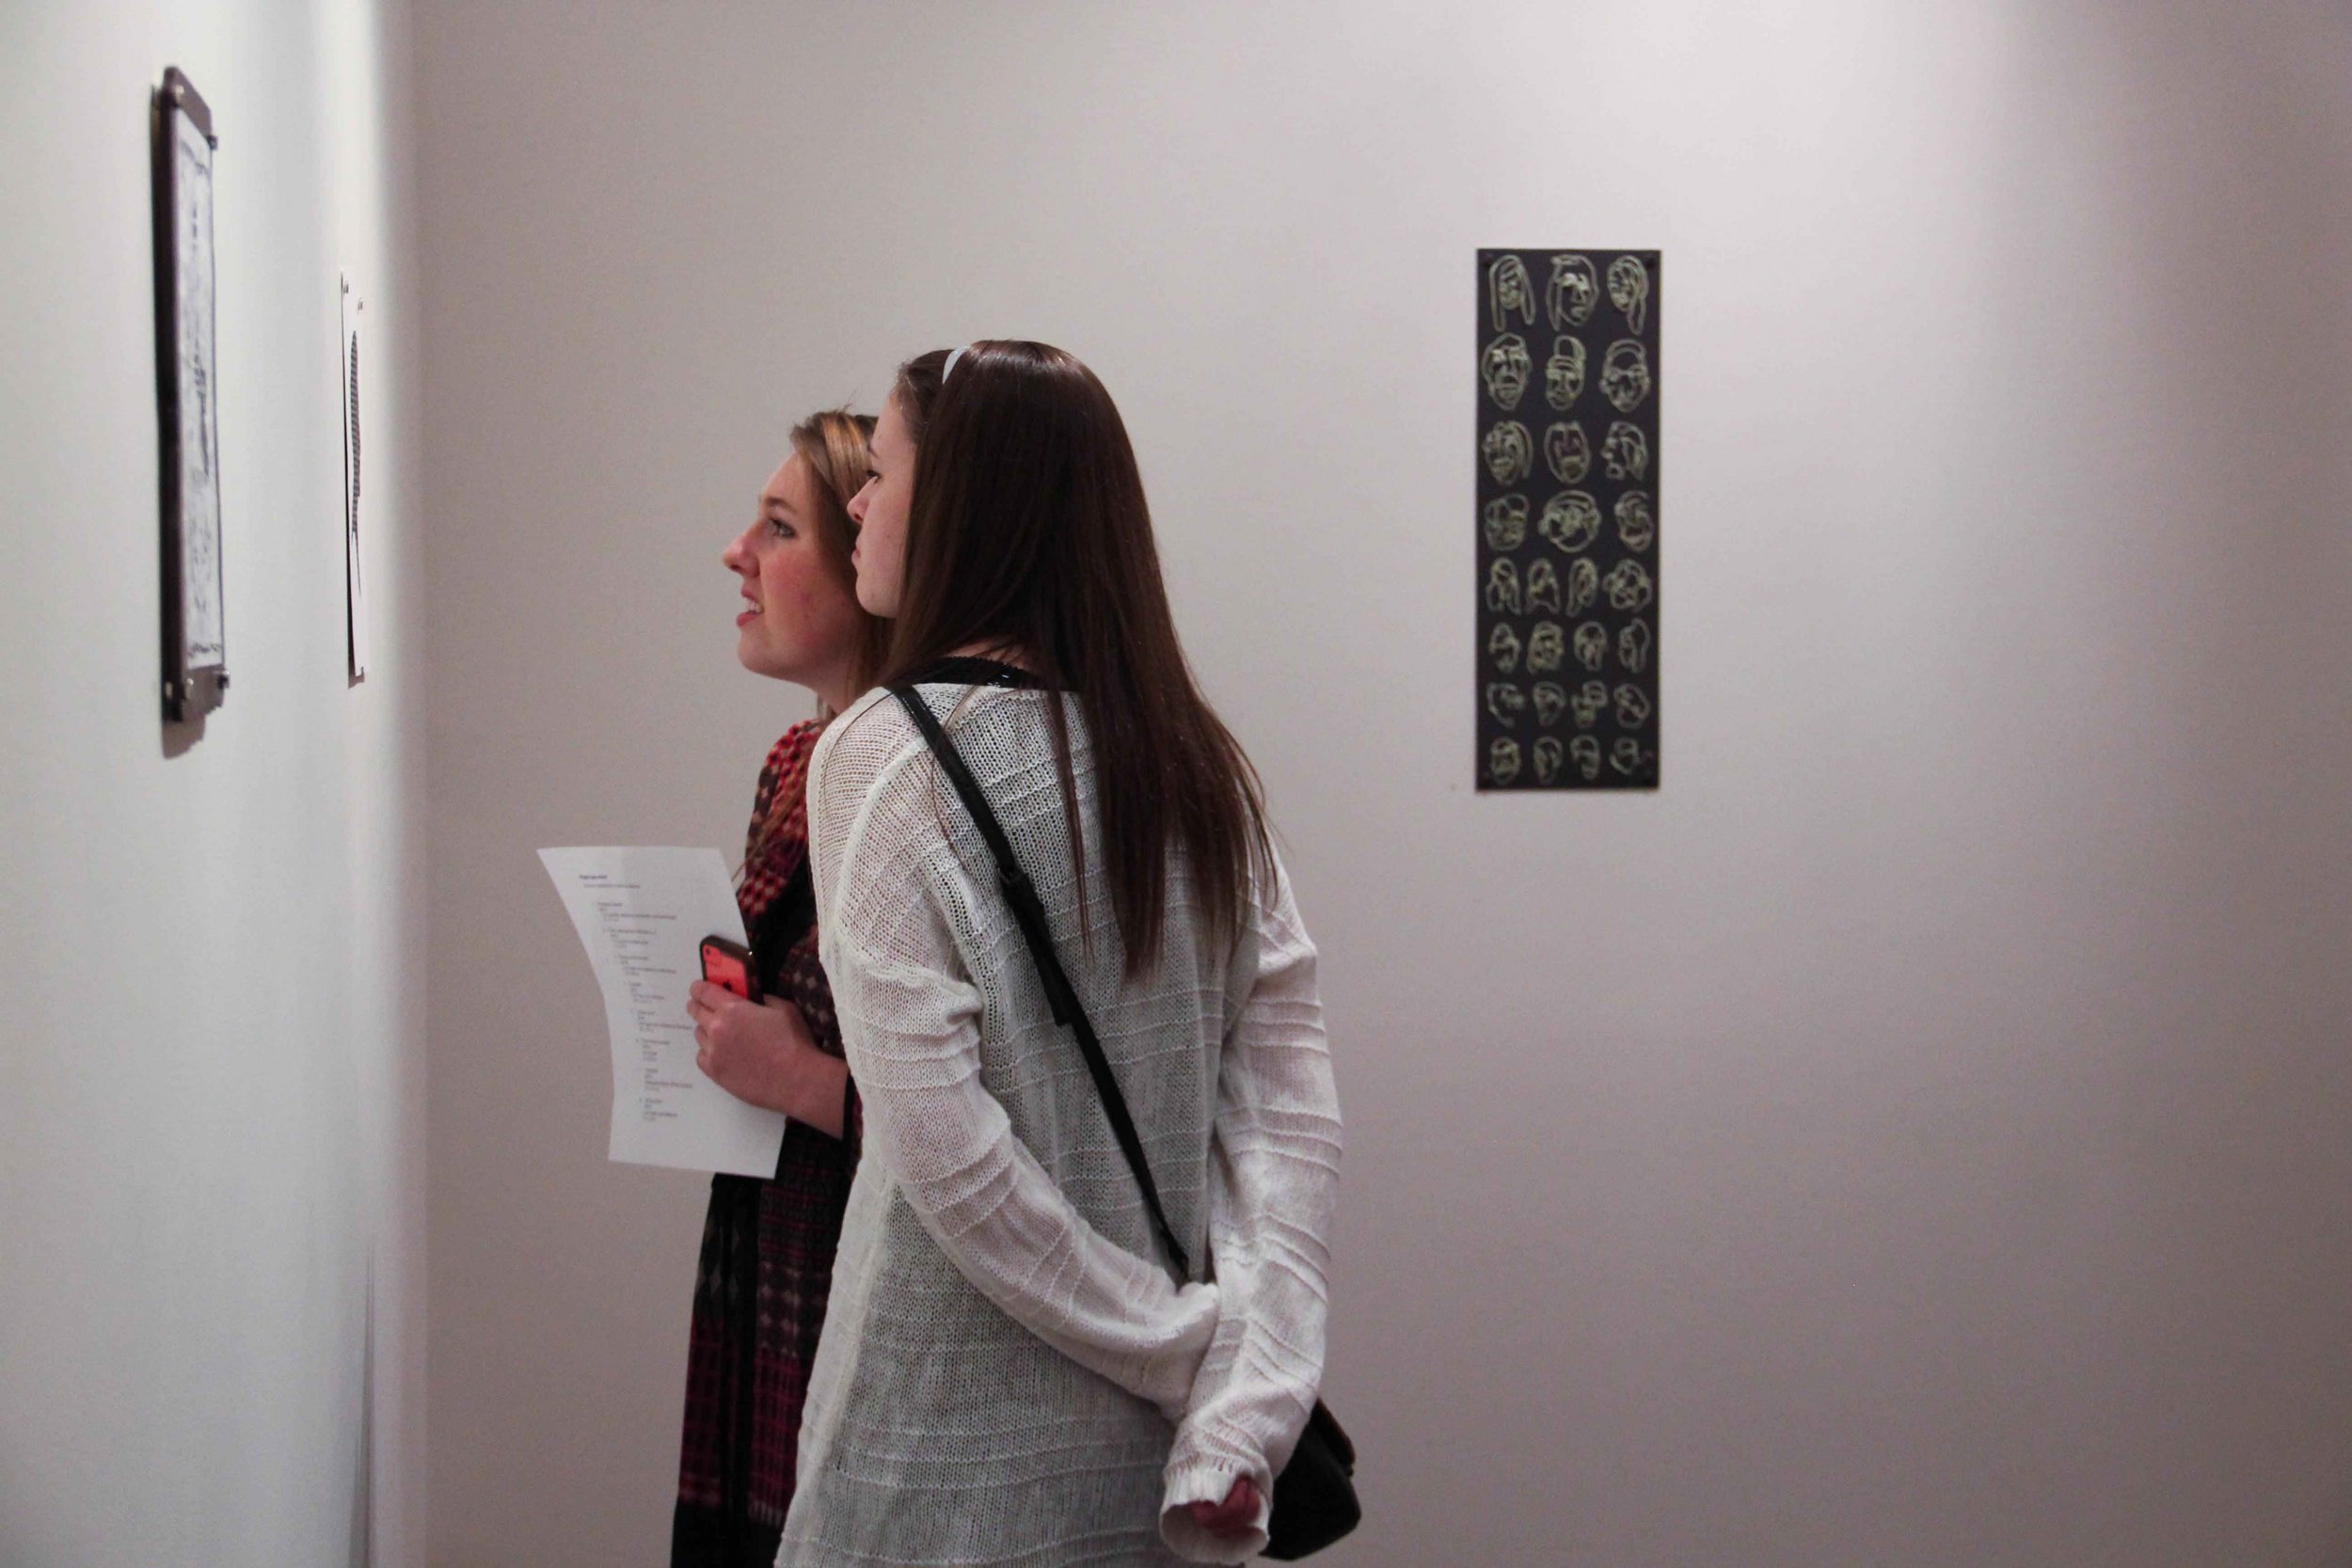 Sophomores Shayla Dougherty and Lexington Johnson enjoy the art presented in the Junior Art Show_Johnson